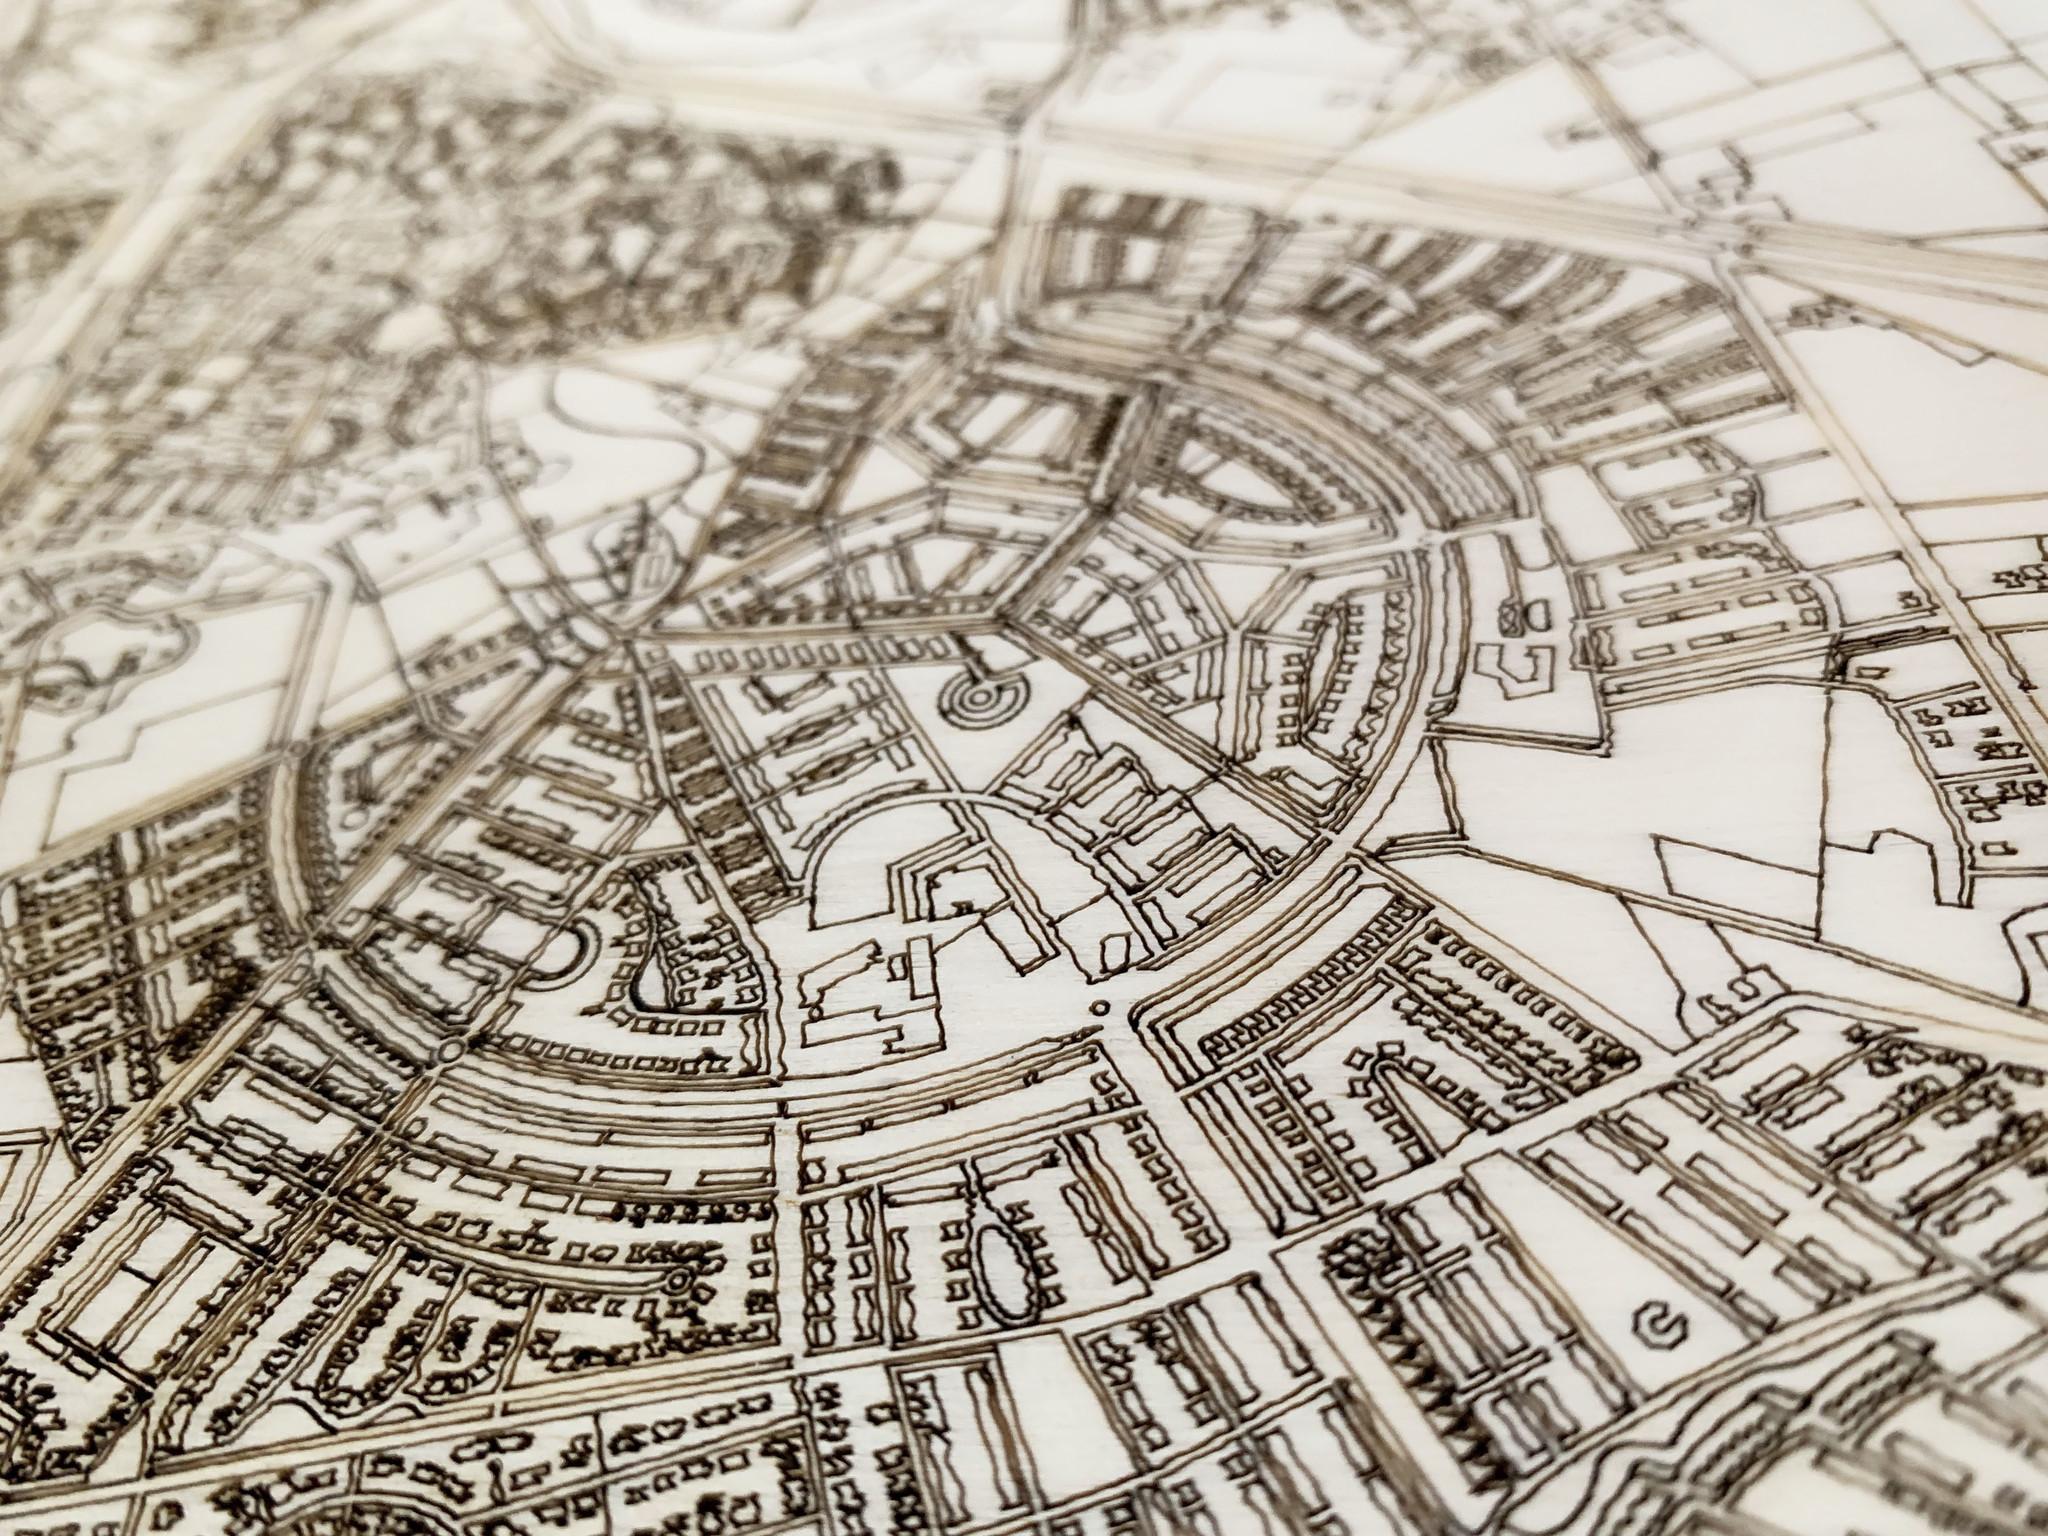 Hölzerner Stadtplan Den Haag-4